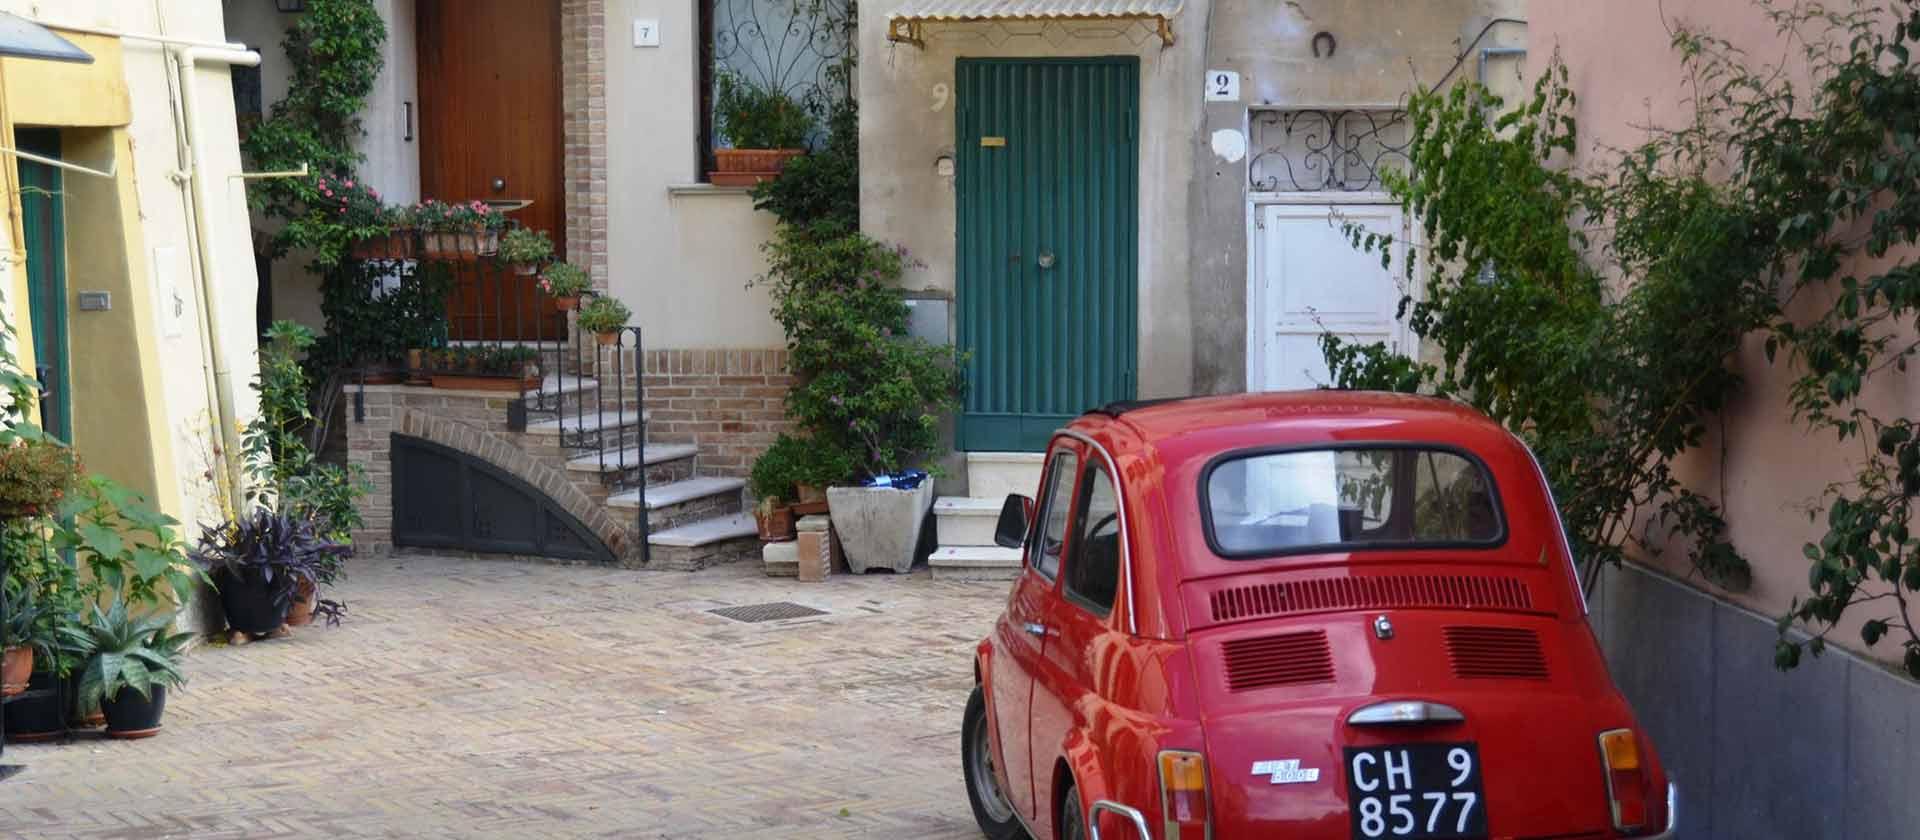 Vasto-Abruzzo-your-base-italia-sweet-italia-05